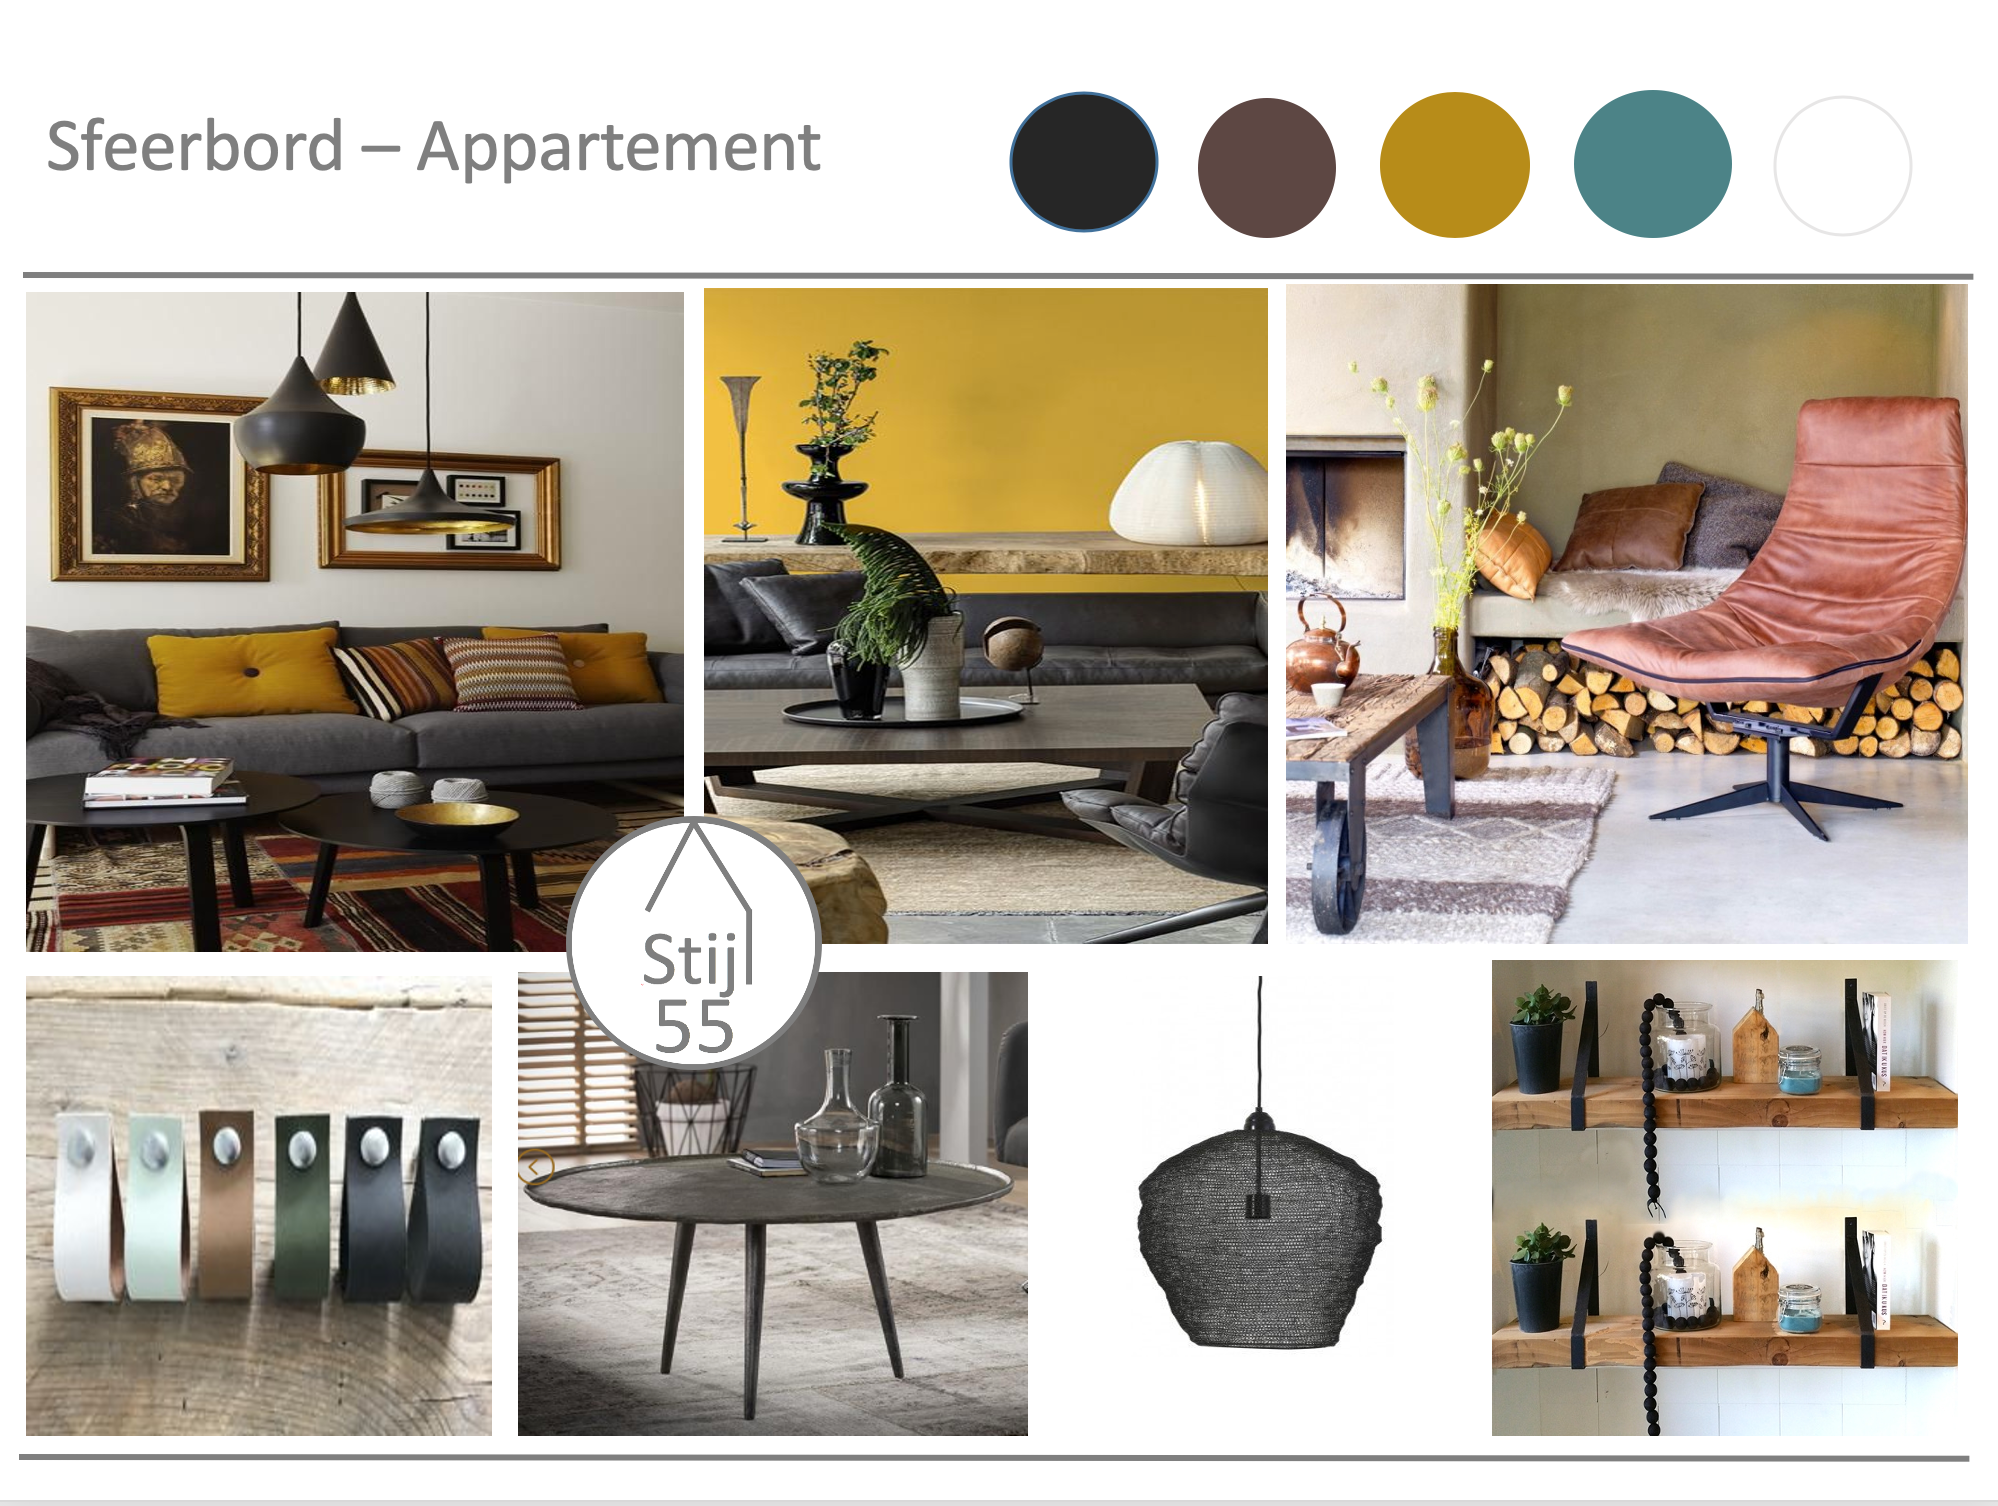 Interieuradvies- kleuradvies- inrichting- styling- woninginrichting - interieurstyling